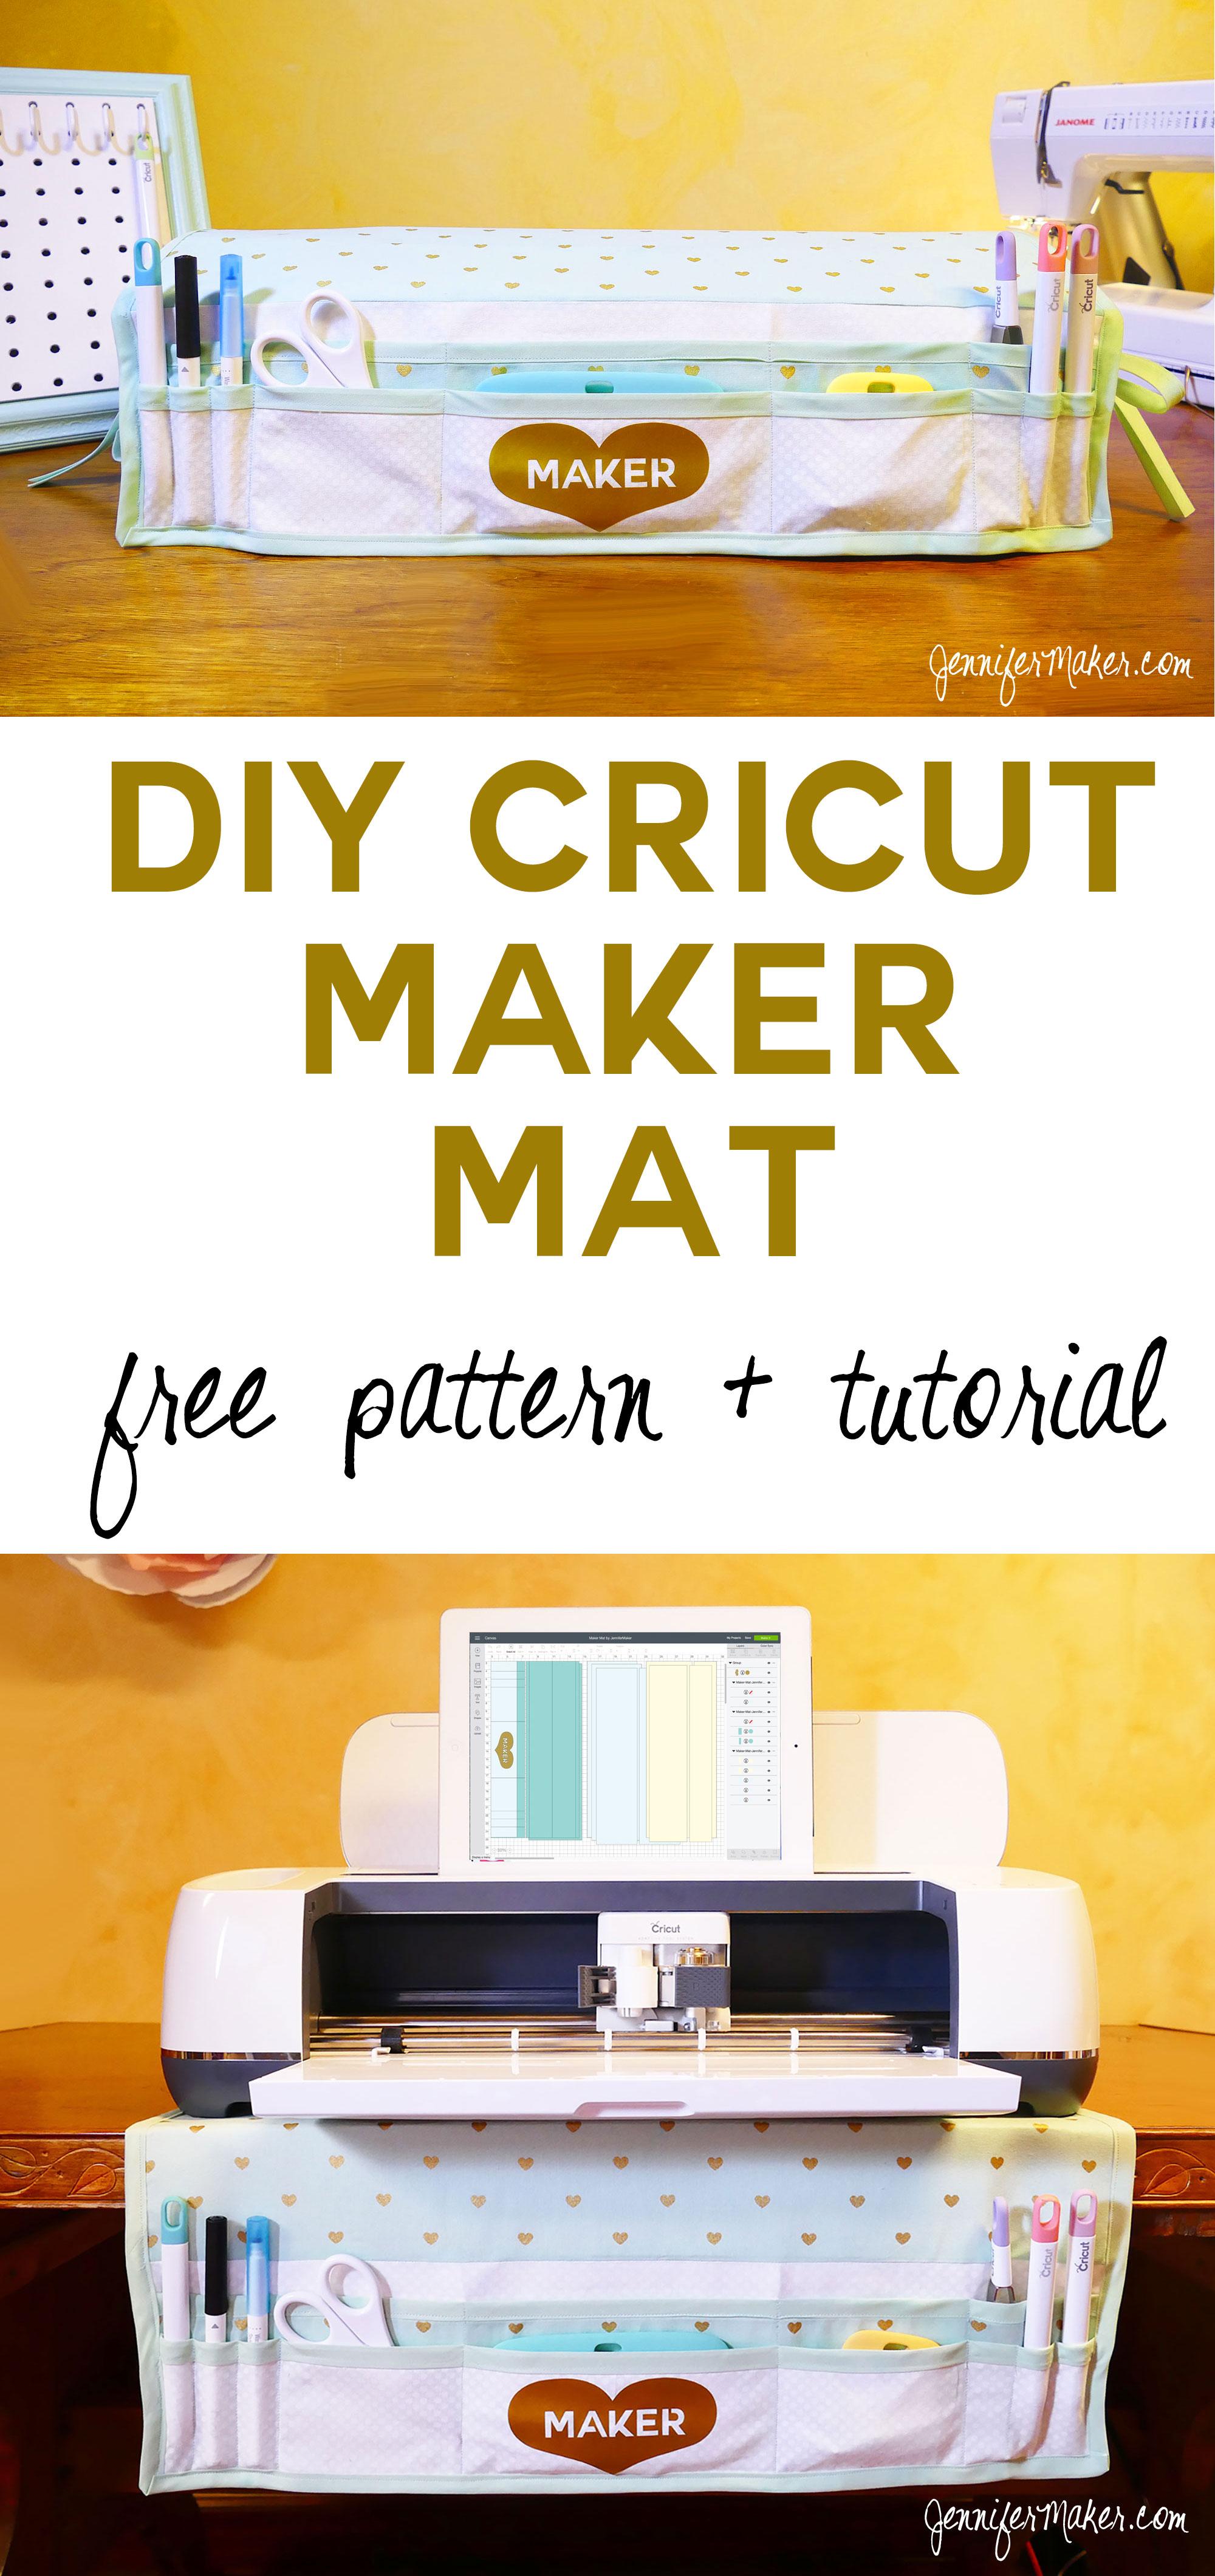 Cricut Maker Mat Tutorial | Dust Cover | Tool Organizer | Free Cut File and Pattern